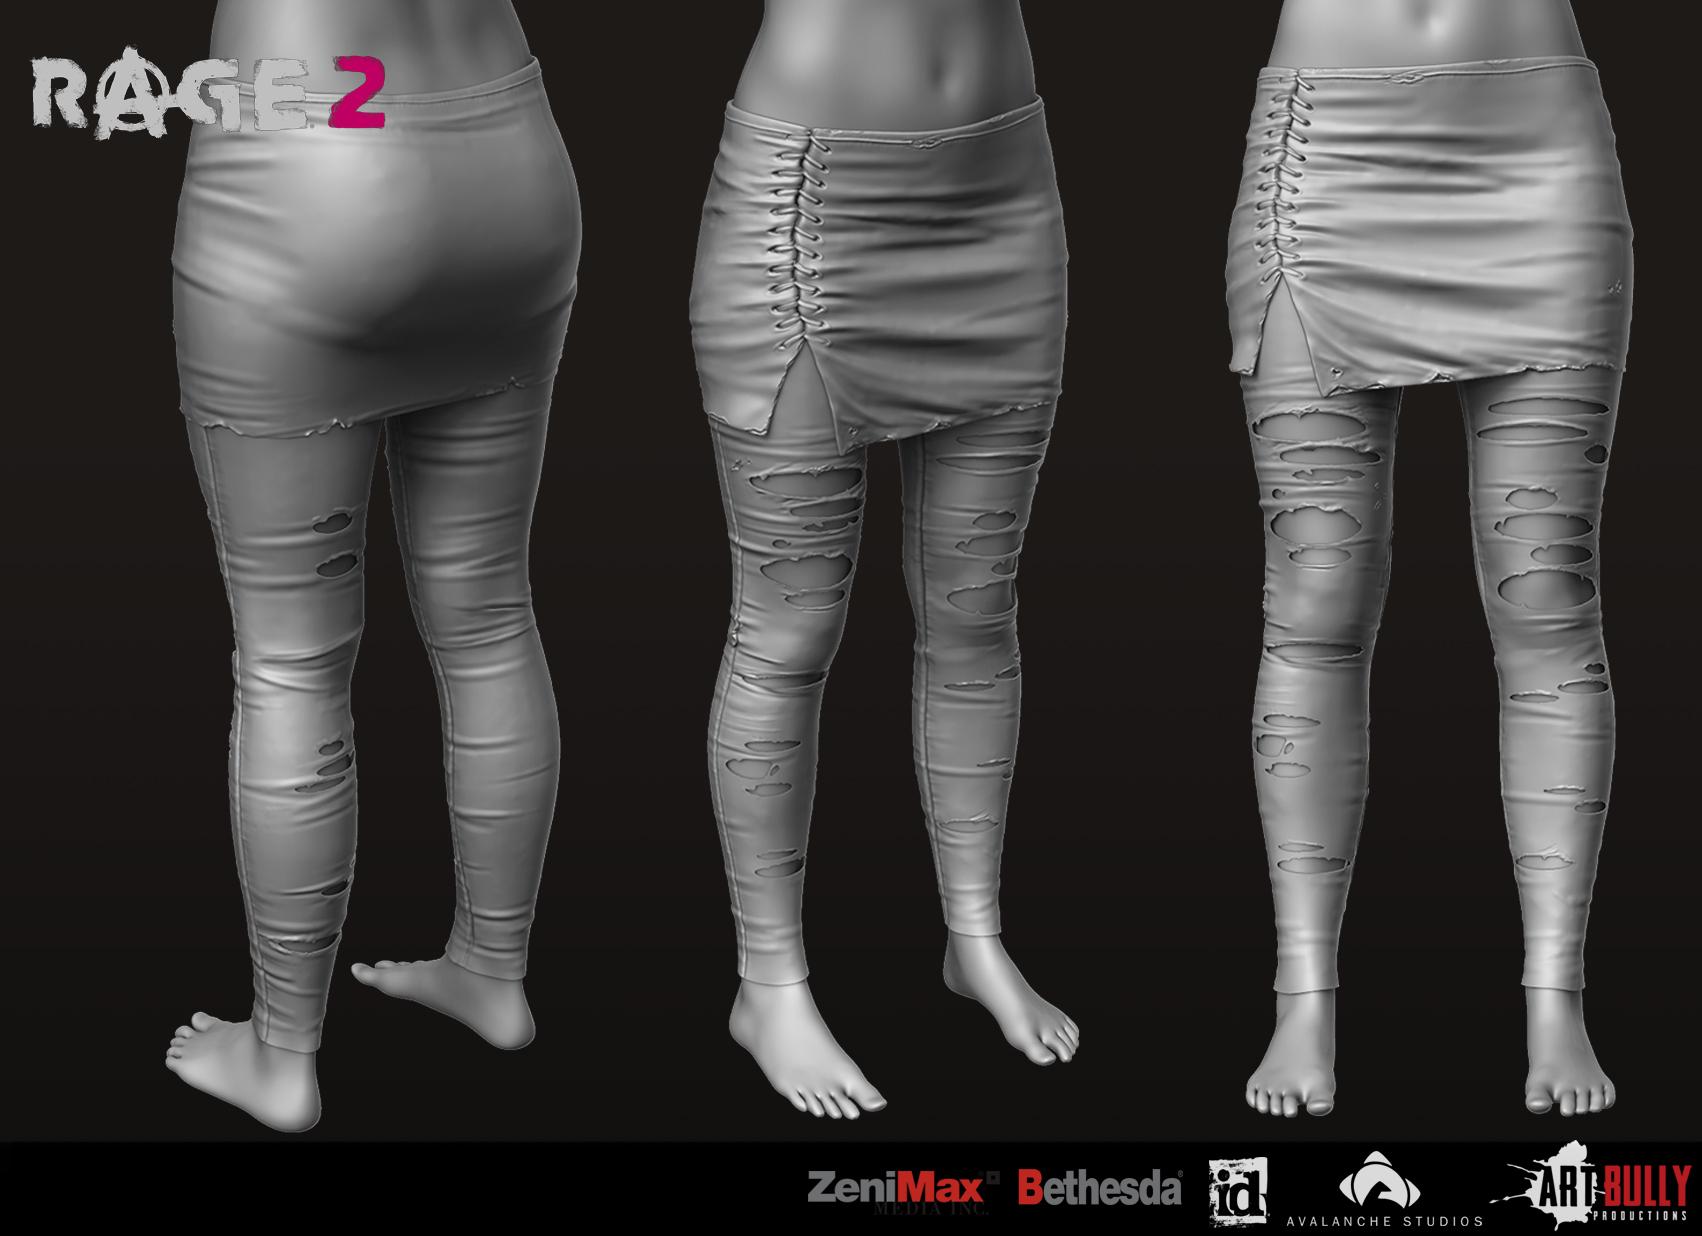 Civilian_Gear_Set_03_Legs_01_Ripped_Leggings_render.jpg